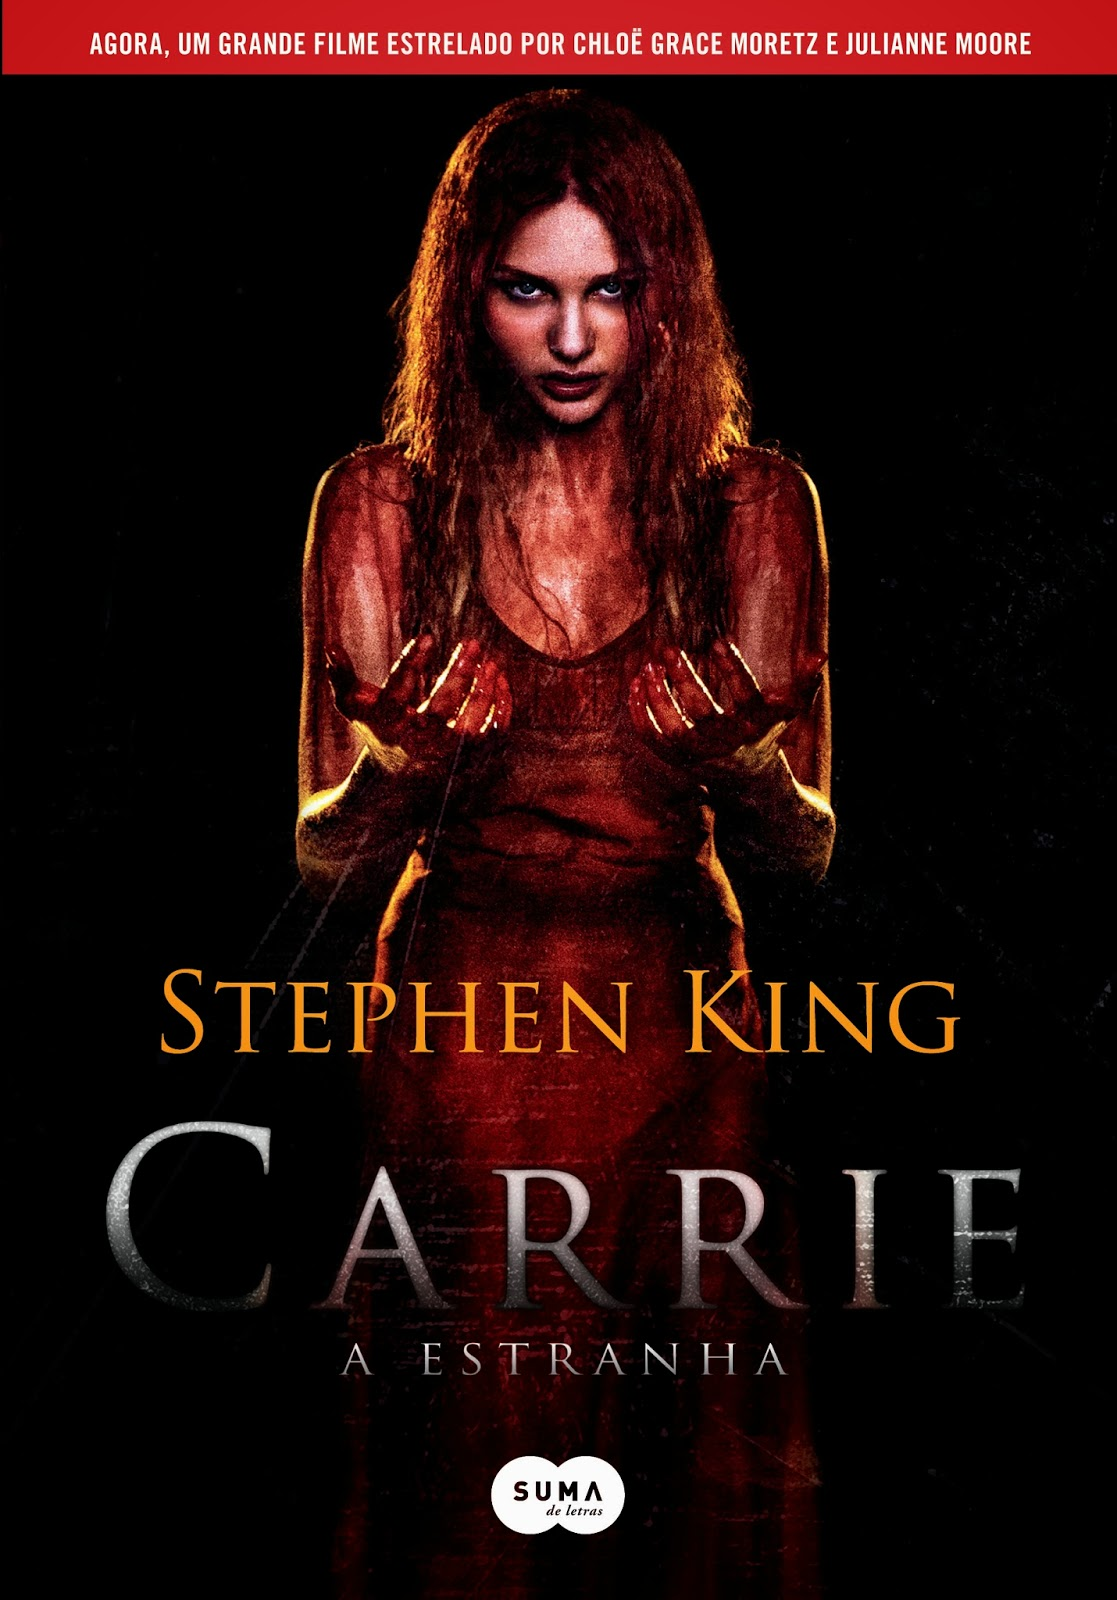 Carrie – A Estranha – Full HD 1080p